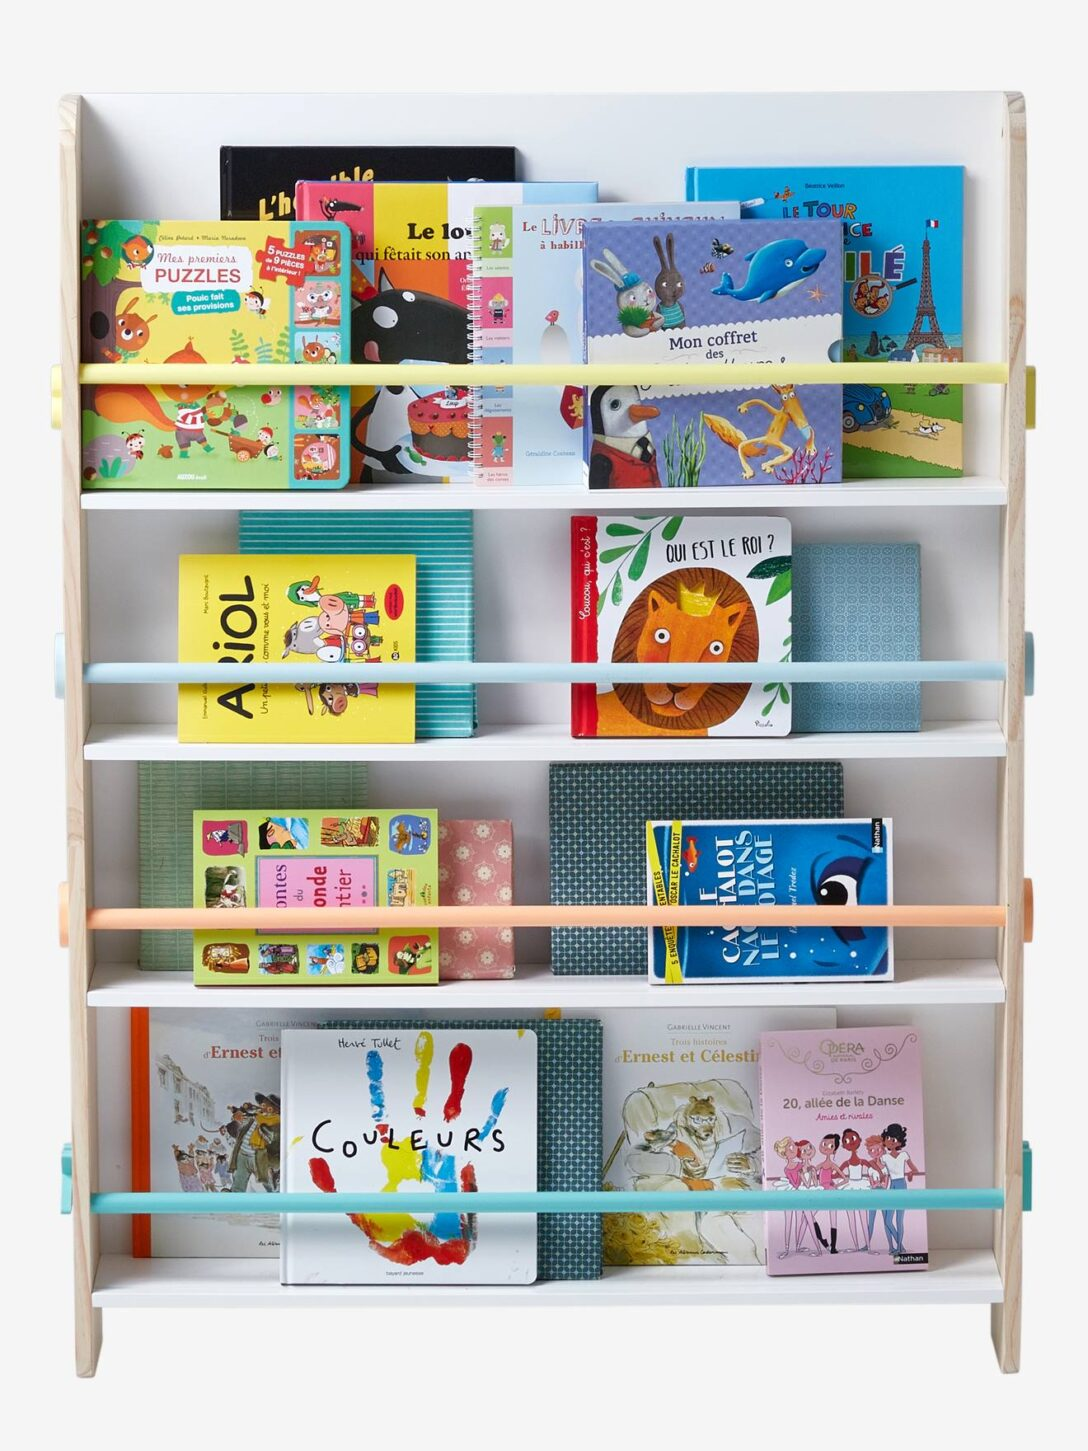 Large Size of Kinderzimmer Bücherregal Vertbaudet Bcherregal Regal Weiß Sofa Regale Kinderzimmer Kinderzimmer Bücherregal